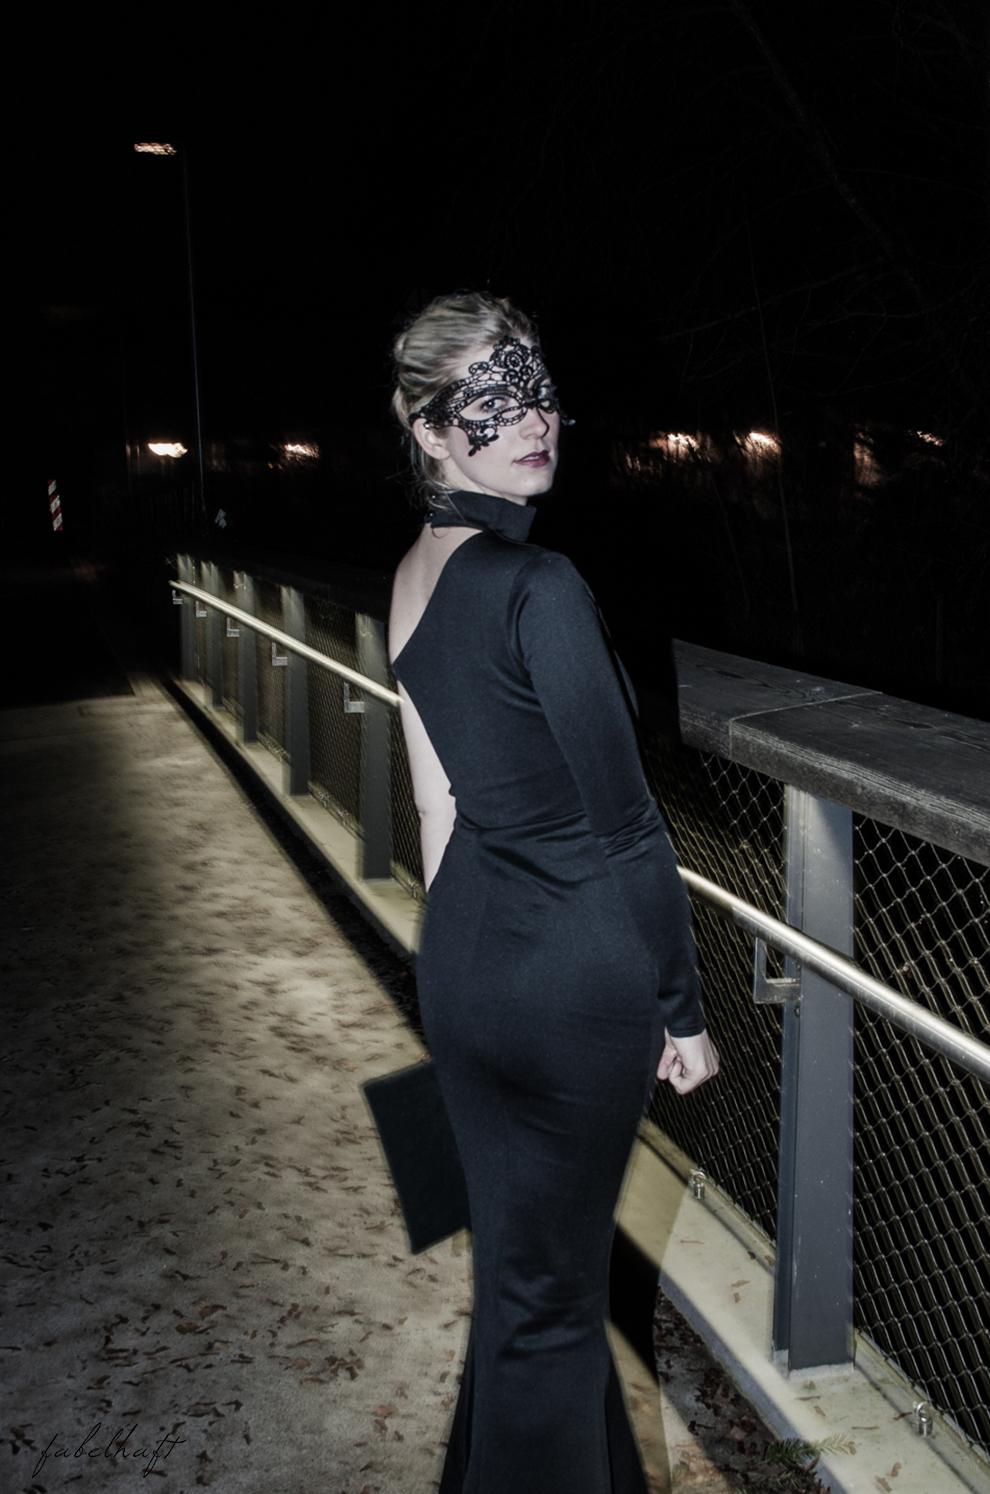 Netzsieger curated shopping silvester outfit kleid schwarz abendoutfit Gala Ballklein blogger Clutch wildleder blond 6